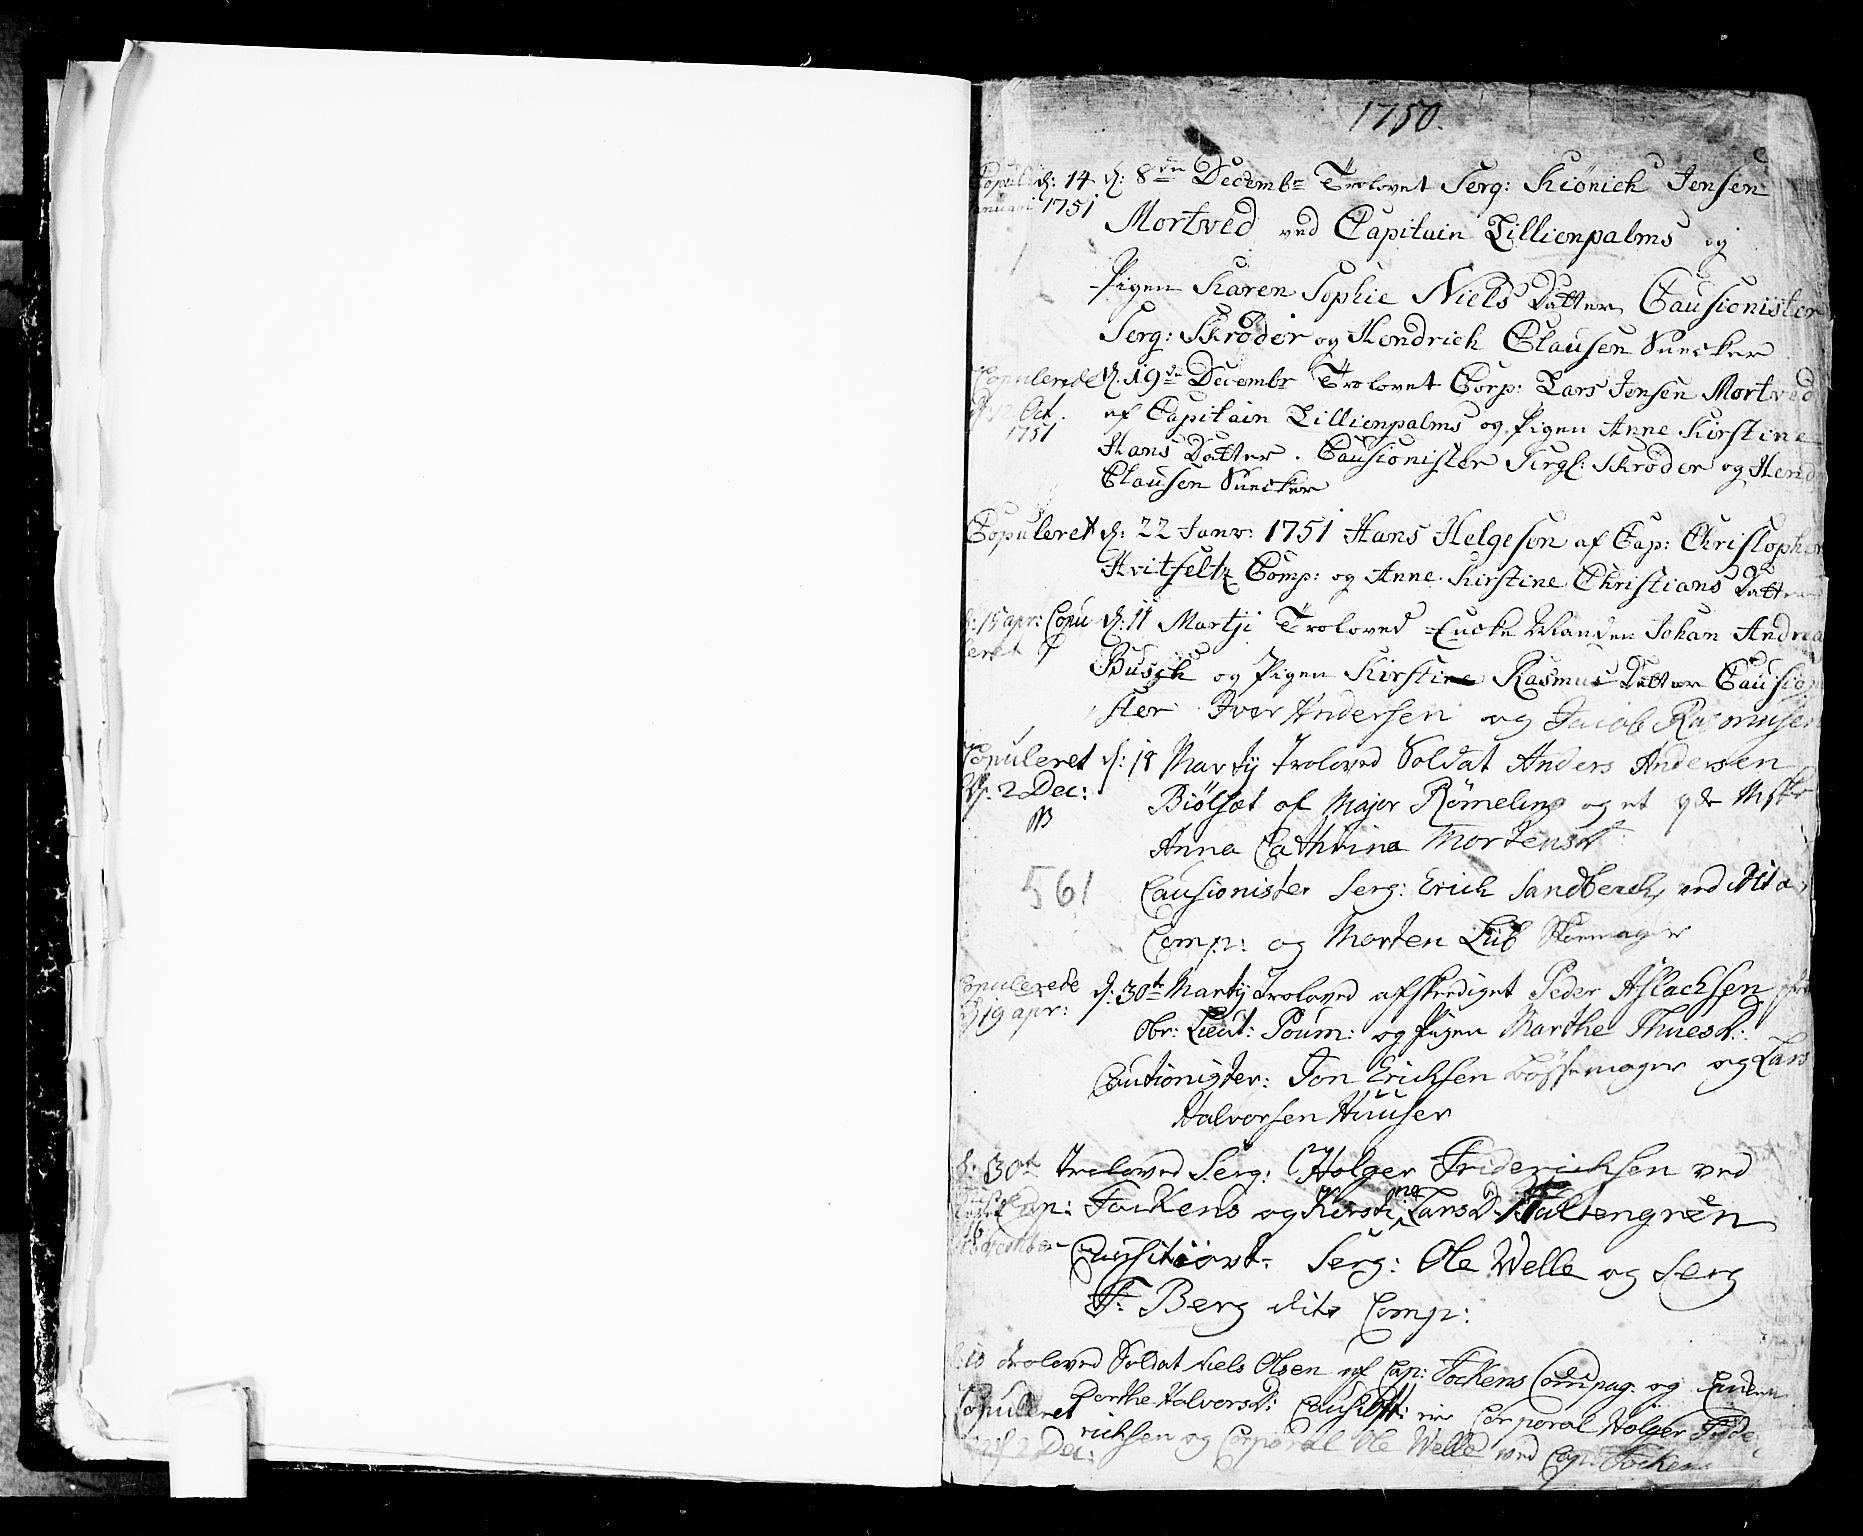 SAO, Fredrikstad prestekontor Kirkebøker, F/Fa/L0002: Parish register (official) no. 2, 1750-1804